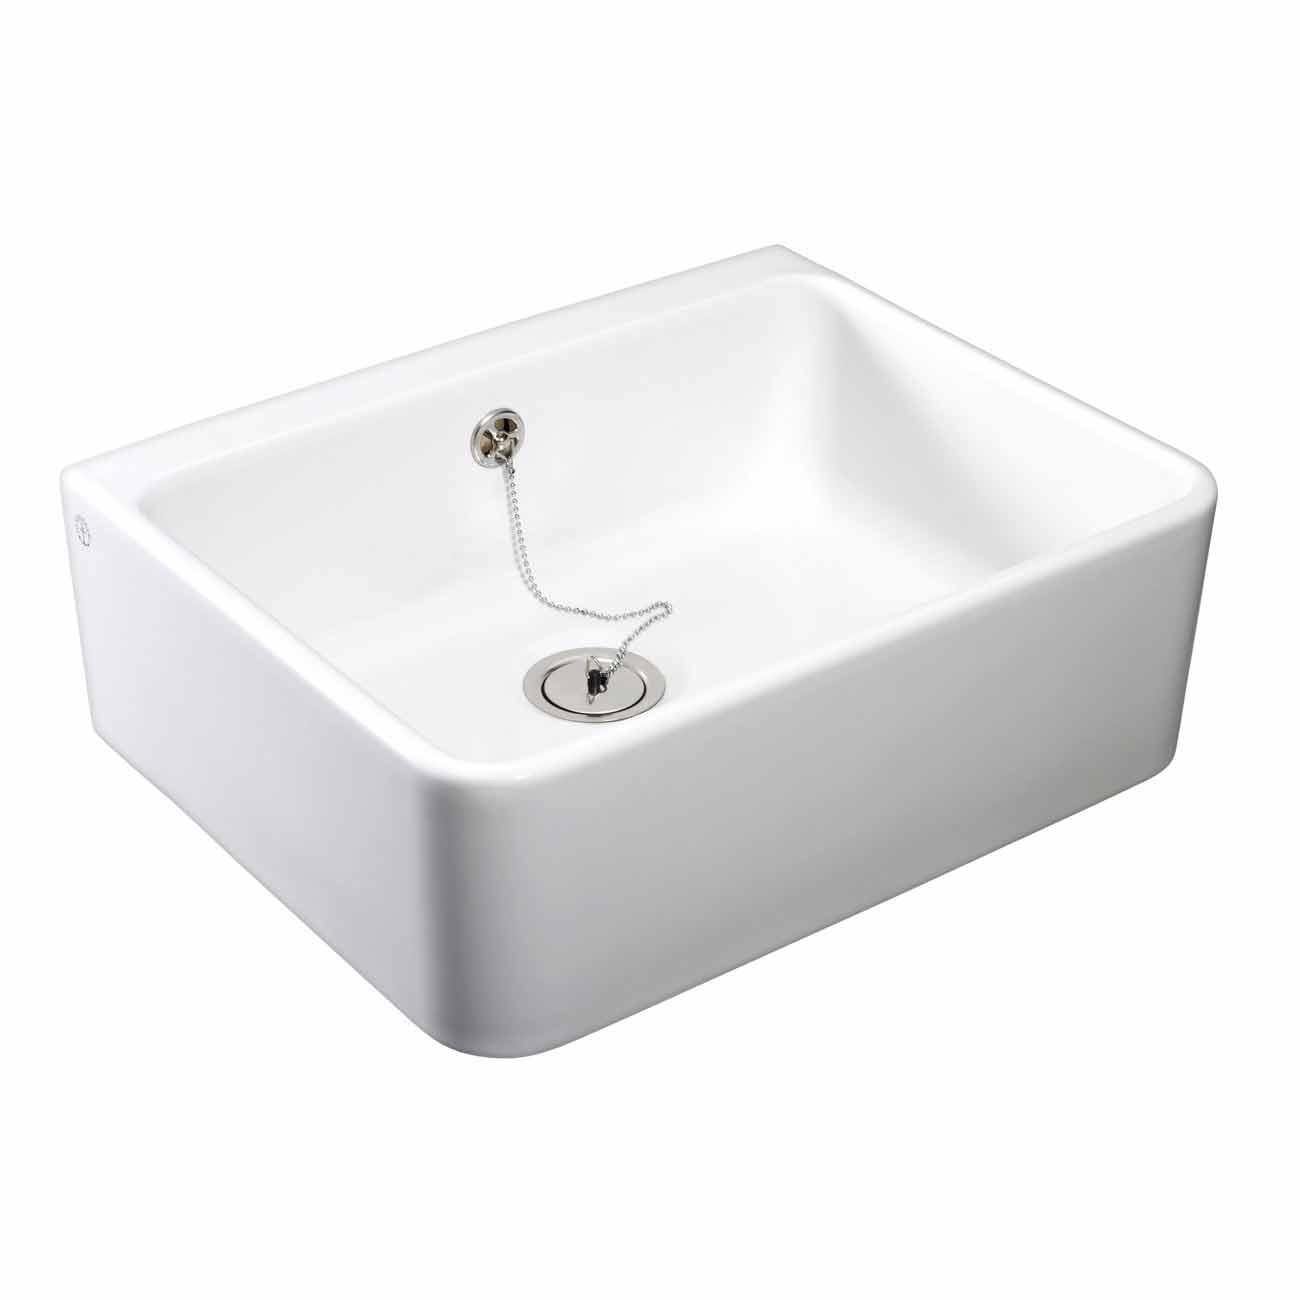 Tvättställ Gustavsberg 6321-99 50 cm